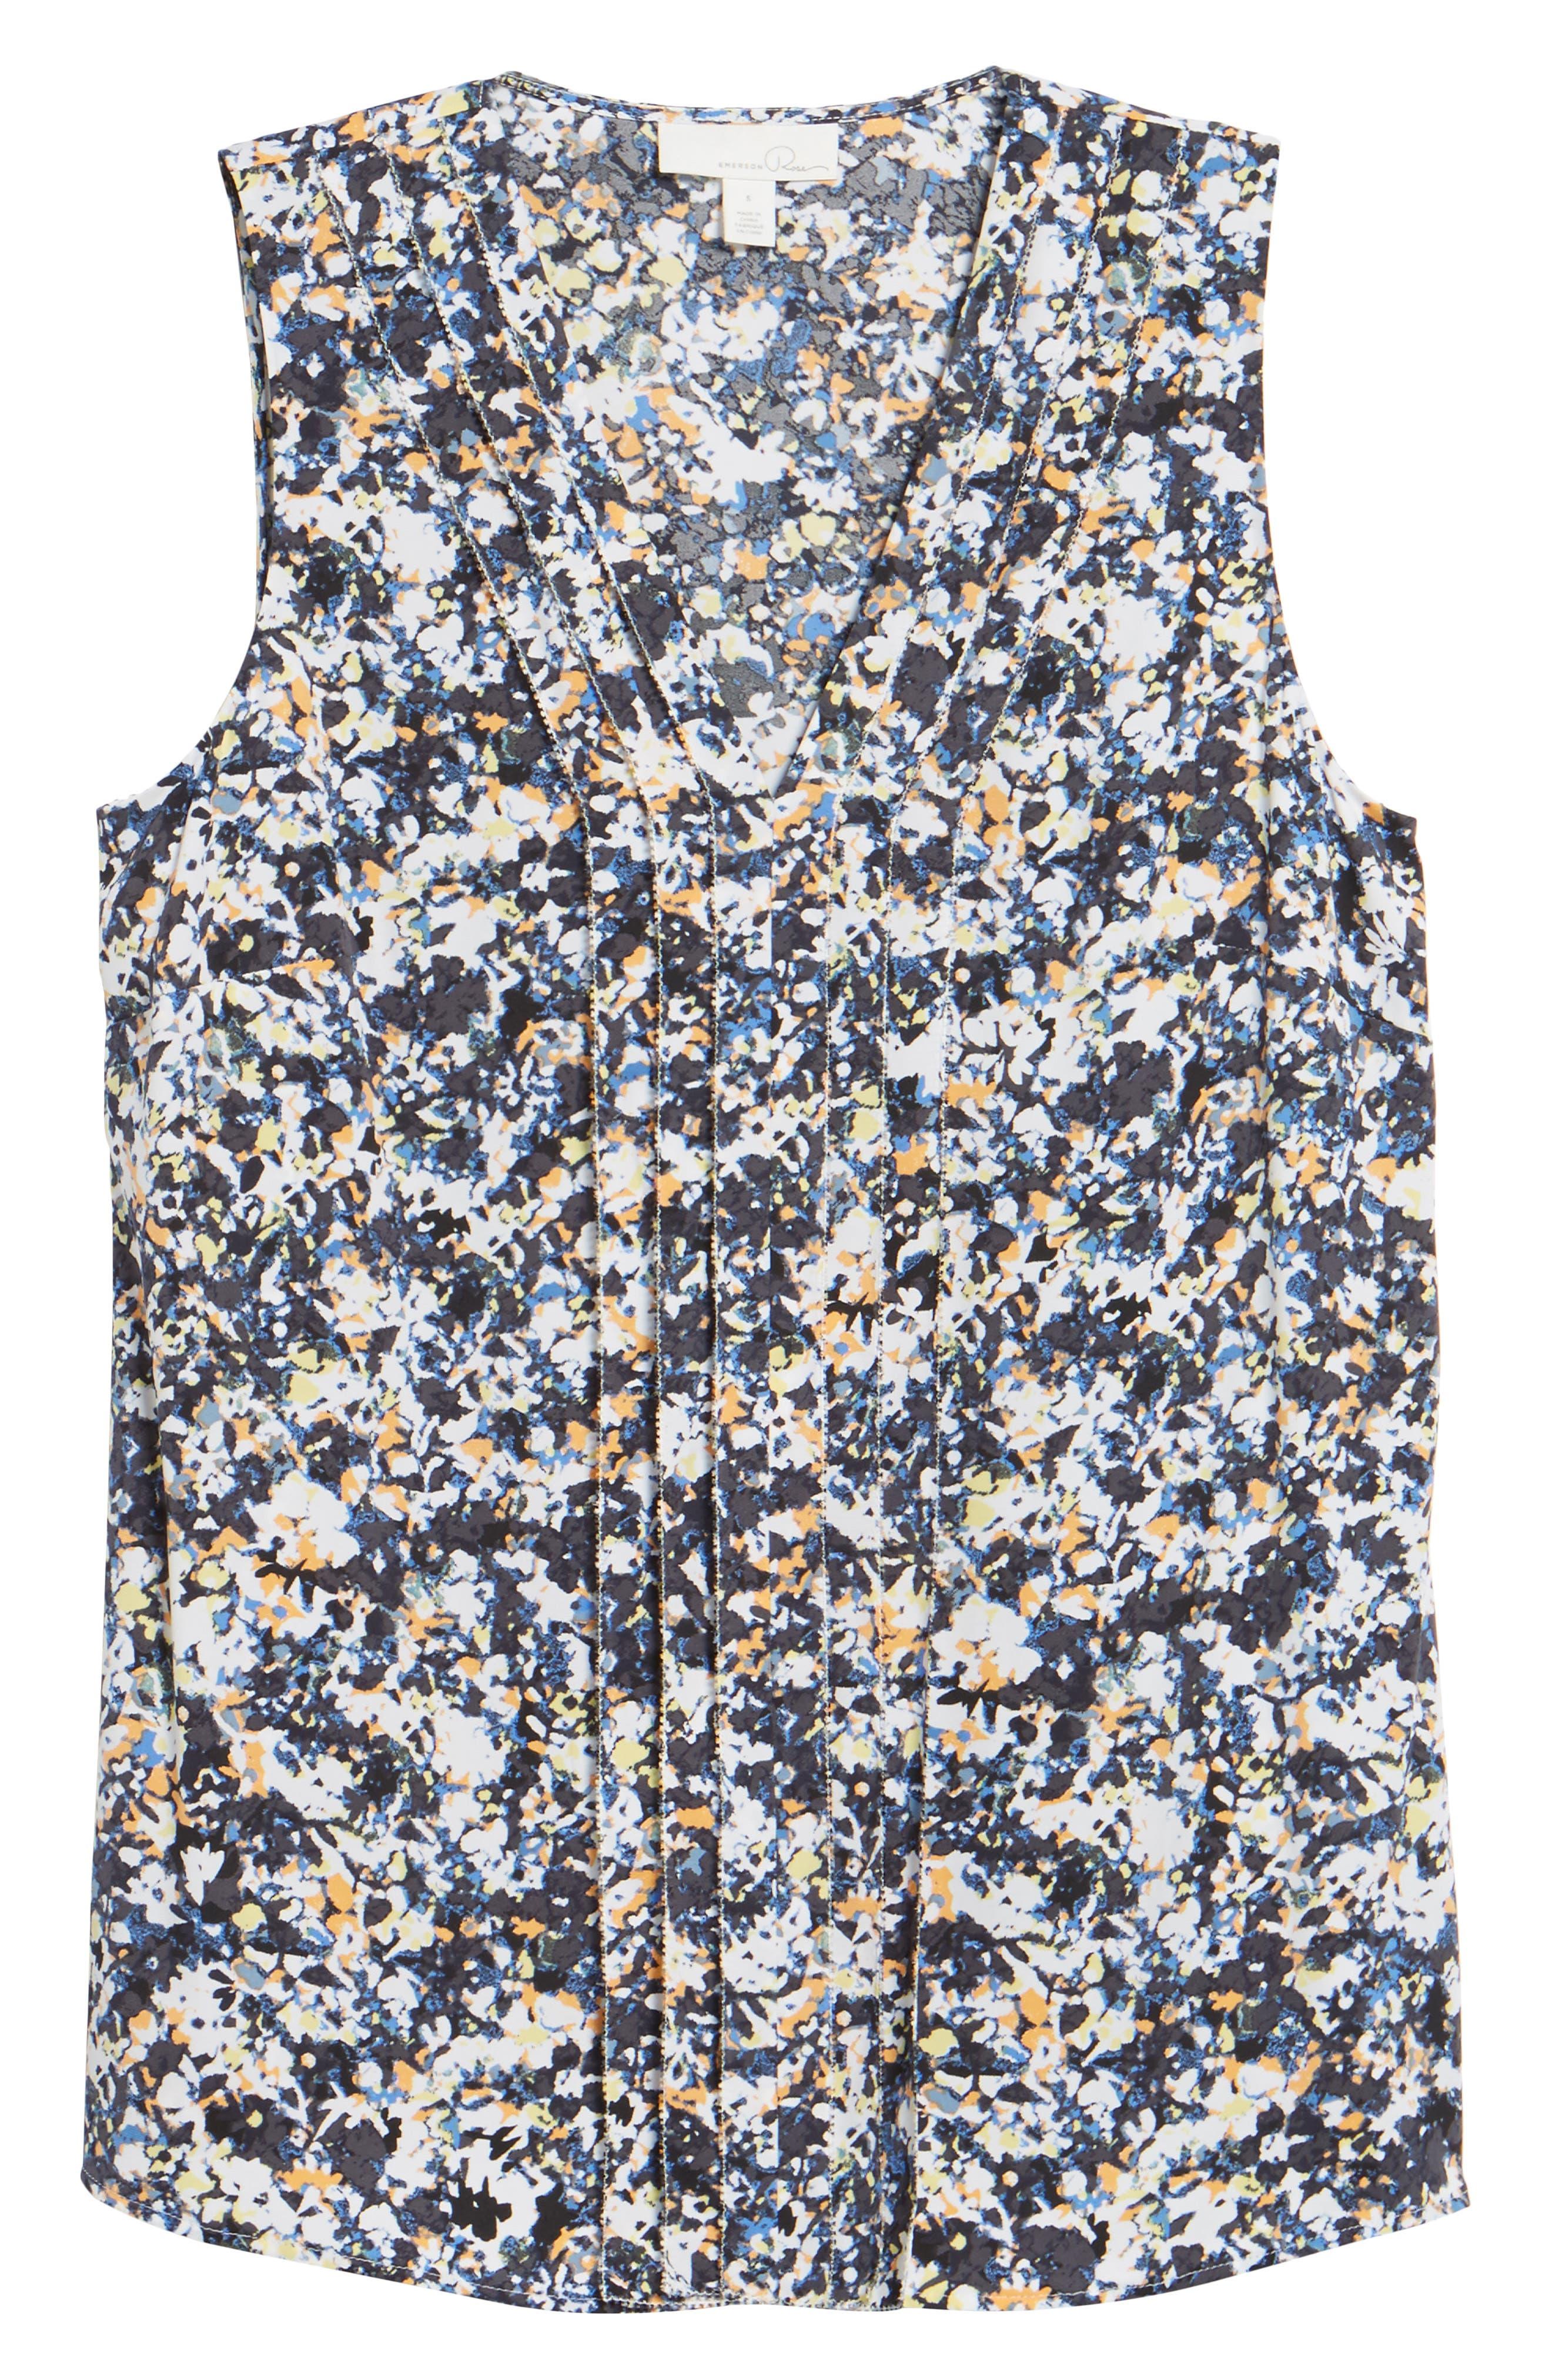 Picot Detail Silk Blend Blouse,                             Alternate thumbnail 6, color,                             Grey Multi Camo Floral